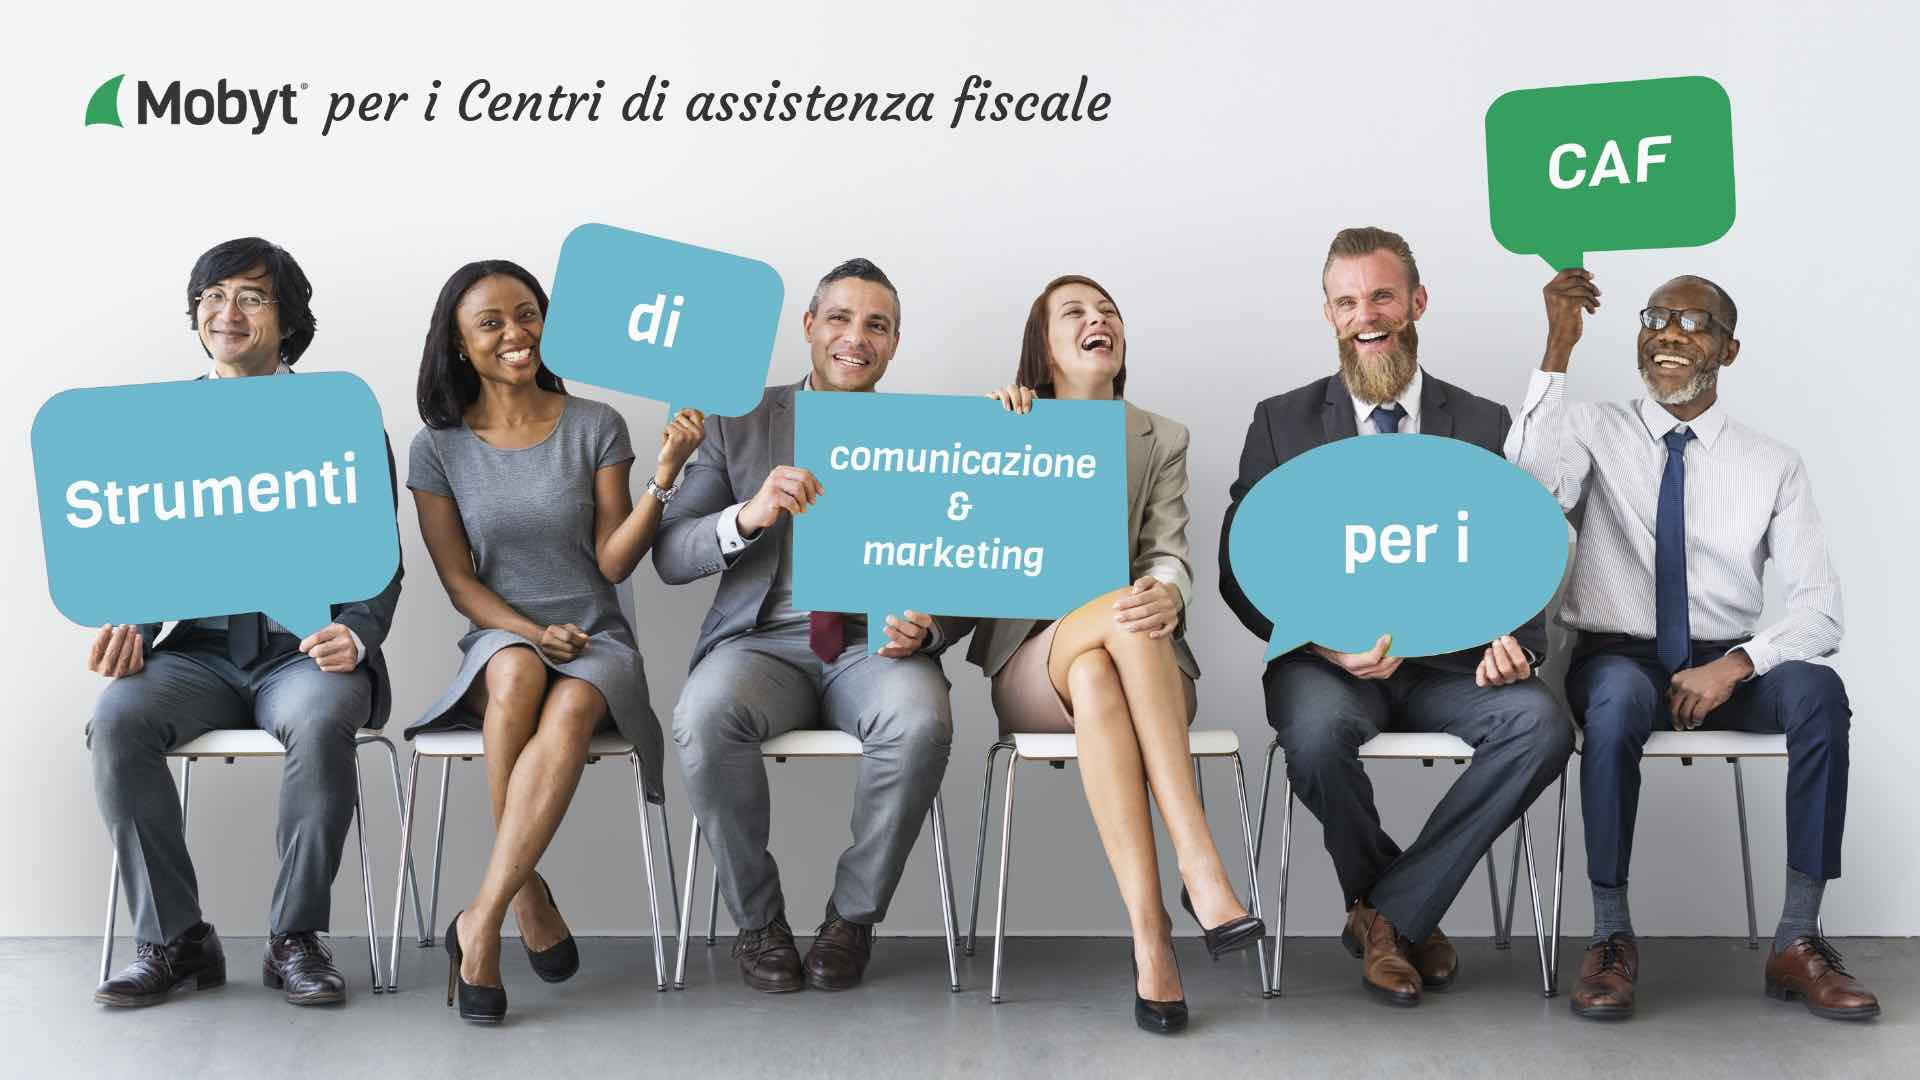 Strumenti di comunicazione e marketing per CAF